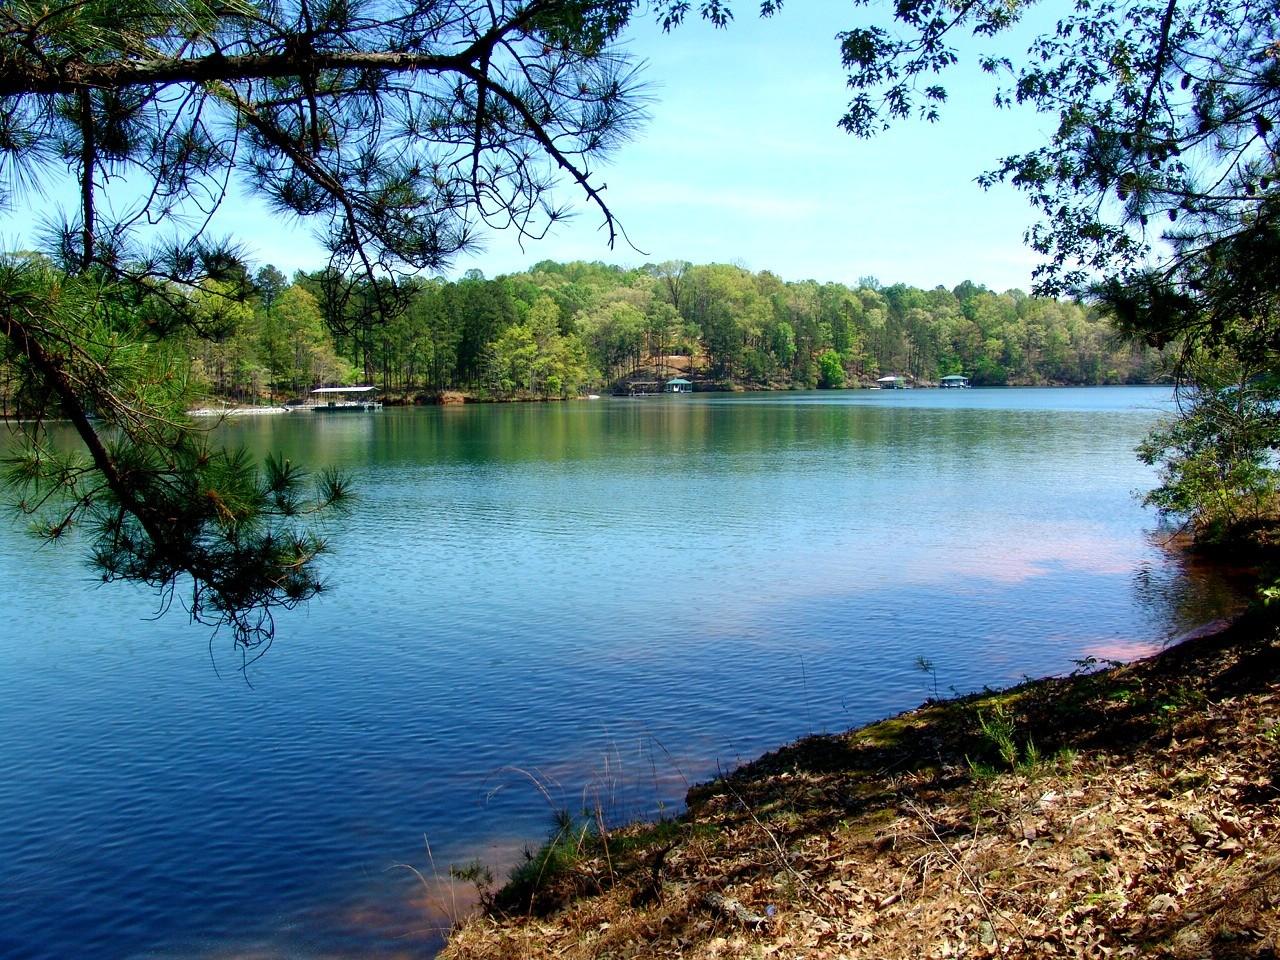 Terreno para Venda às Lot Boasts Beautiful Views of Lake Keowee's Emerald Green Water Lot 81 West Union, Carolina Do Sul, 29696 Estados Unidos